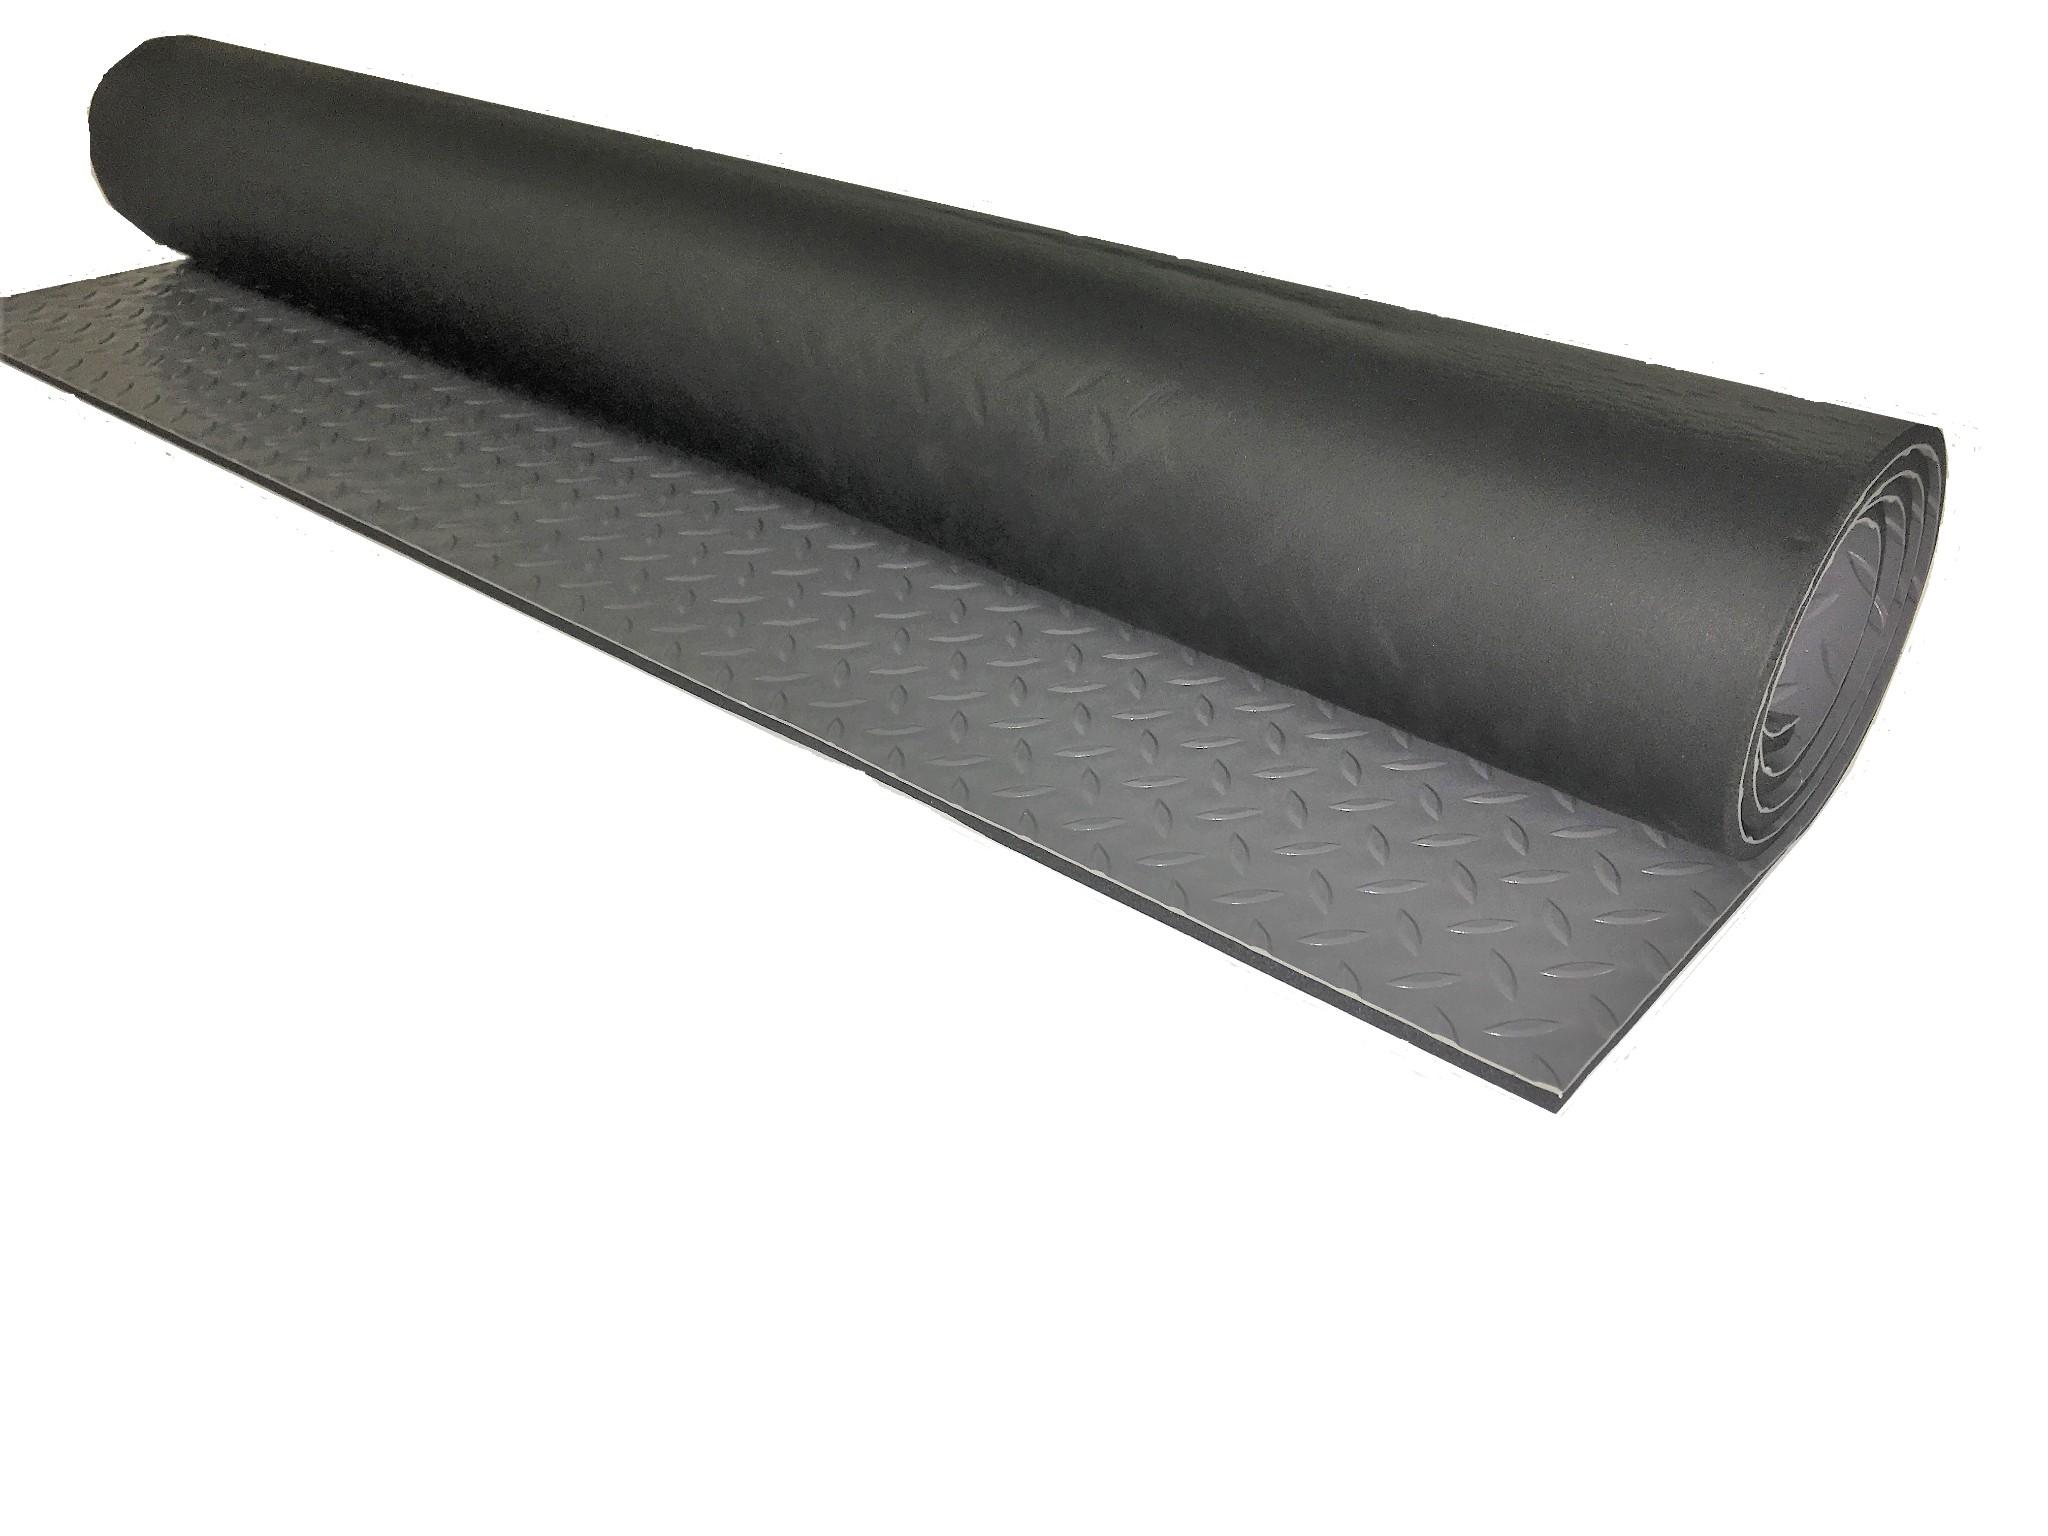 cell silentmatsounddeadeningshop proofing foam deadening closed sheets mat car vehicle site sound insulation home